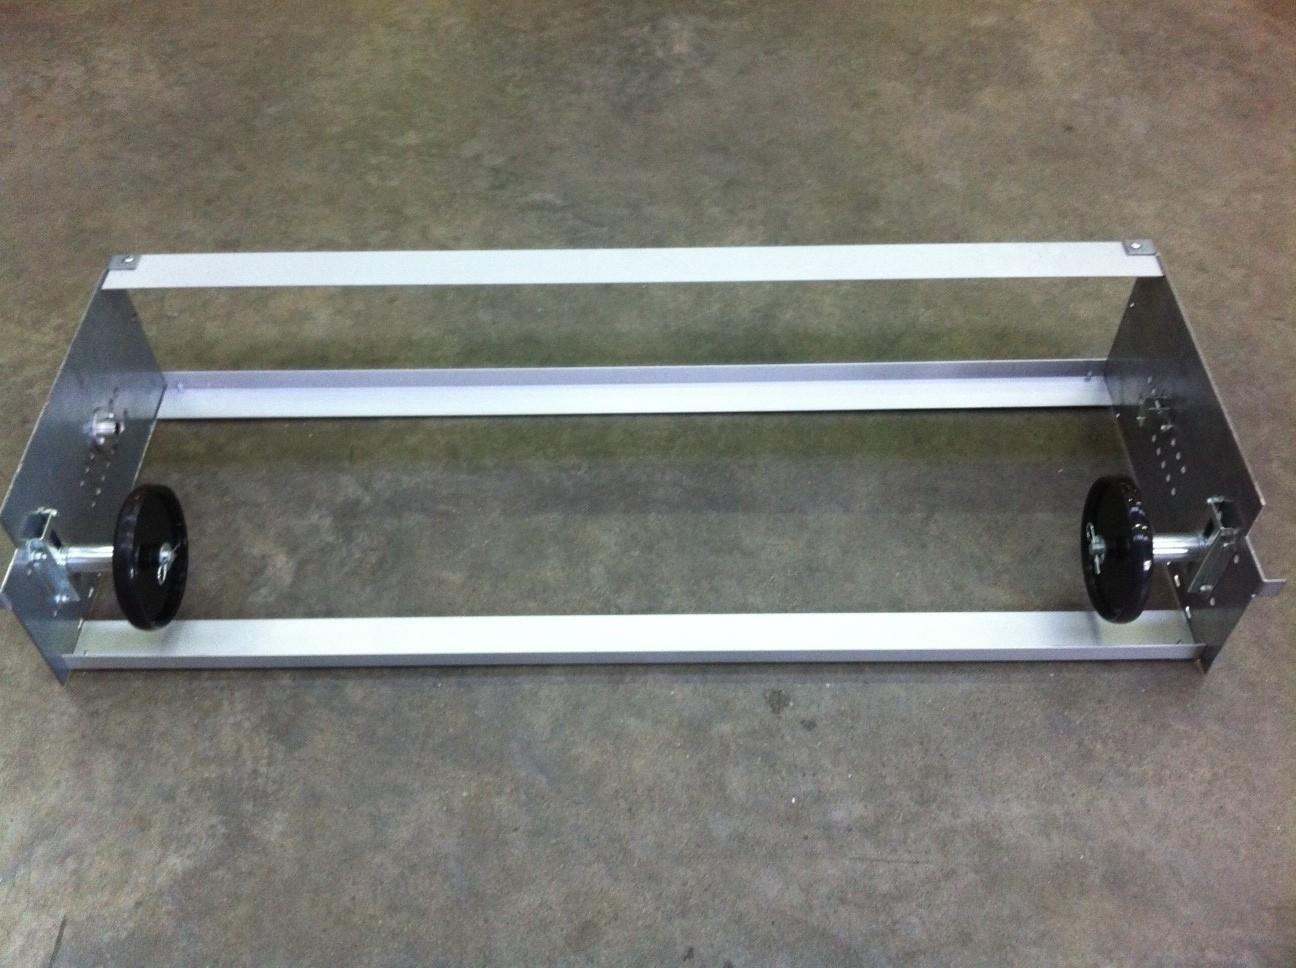 Chassis rideau aluminium ready